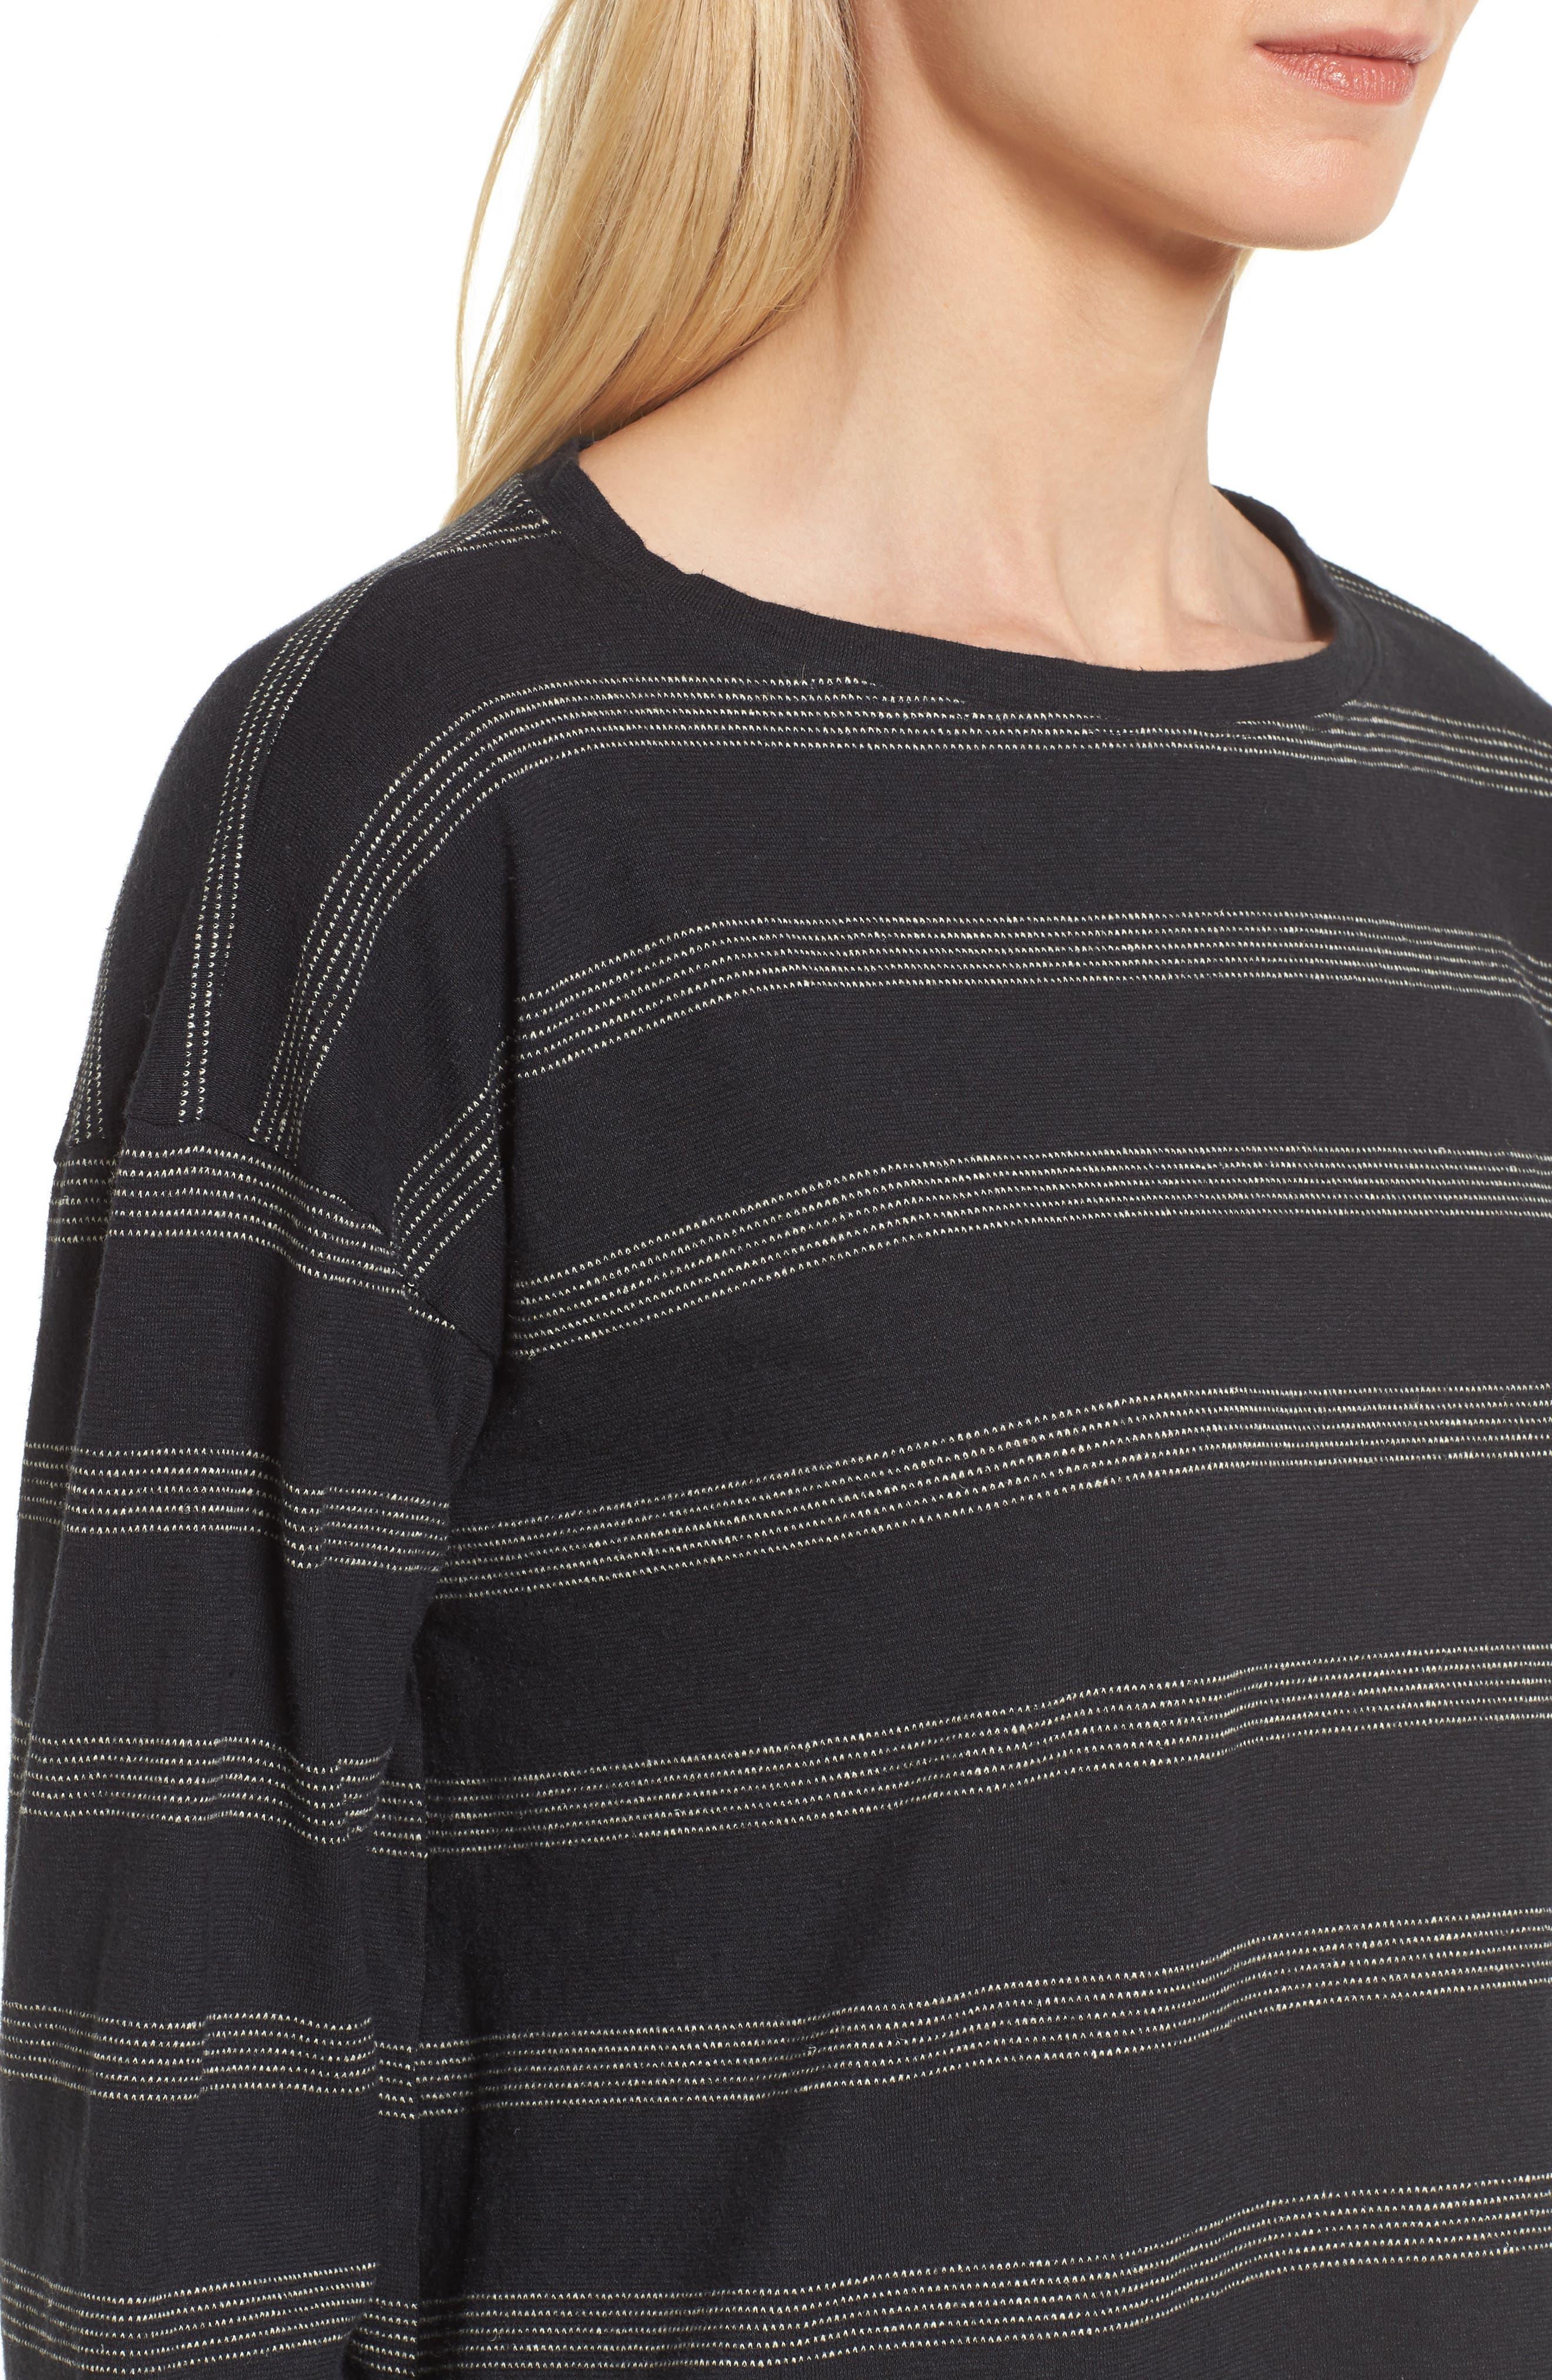 Stripe Hemp & Organic Cotton Top,                             Alternate thumbnail 4, color,                             Black